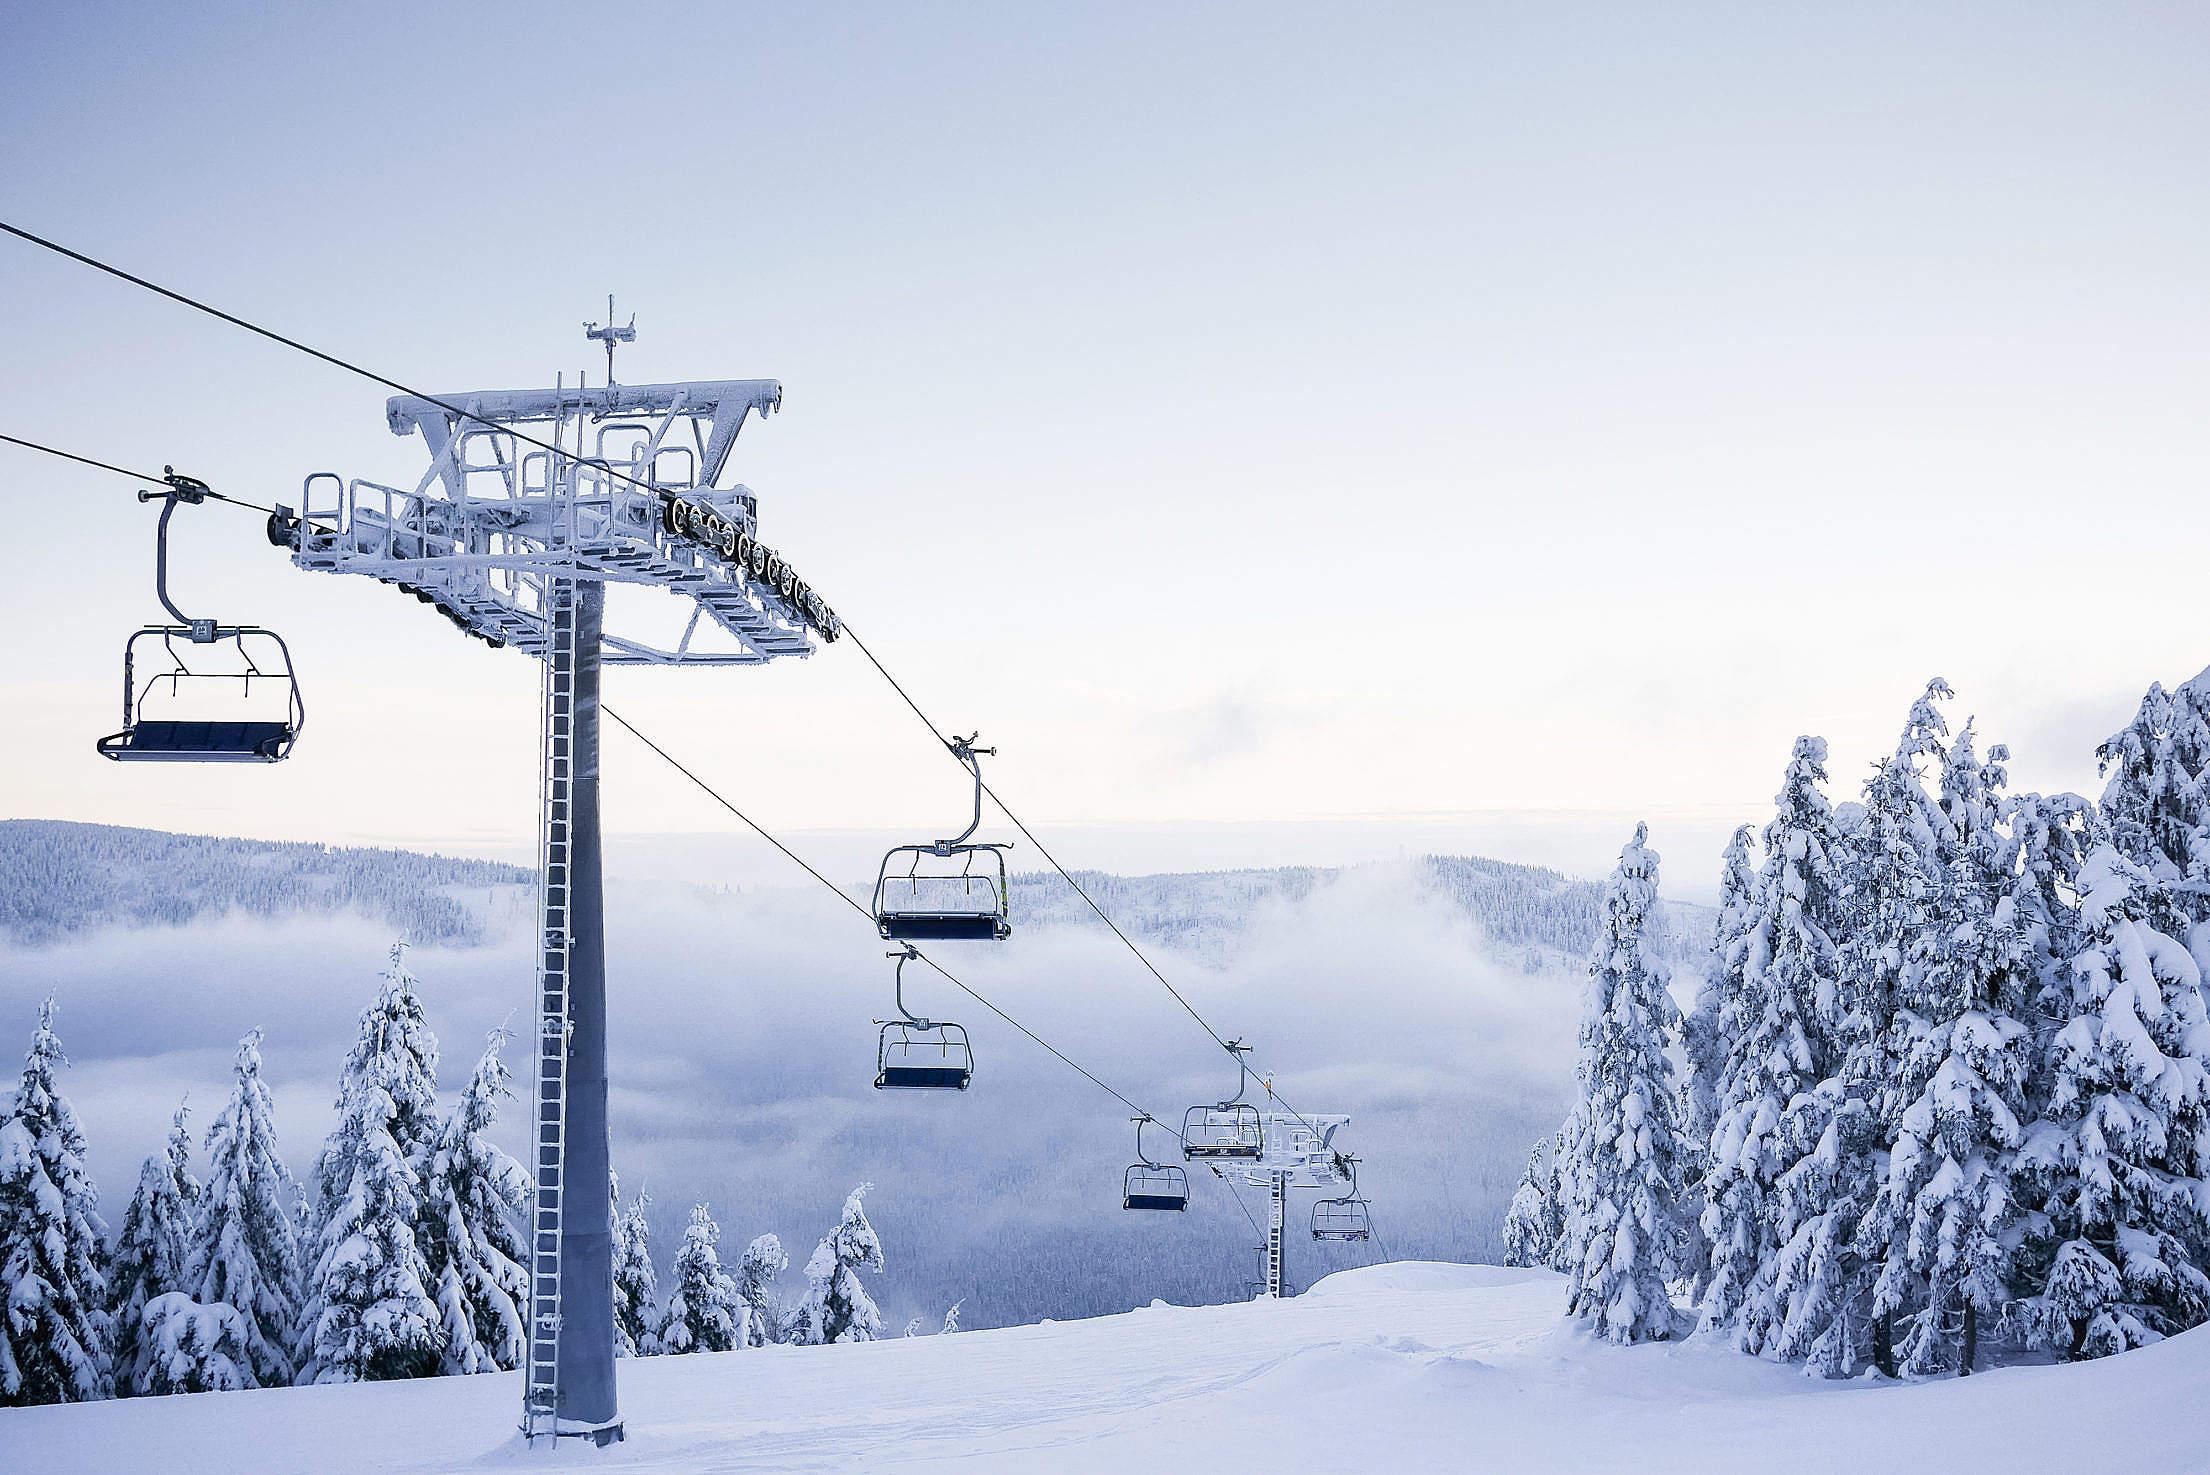 Empty Chair Ski Lift on Bright Winter Day Free Stock Photo